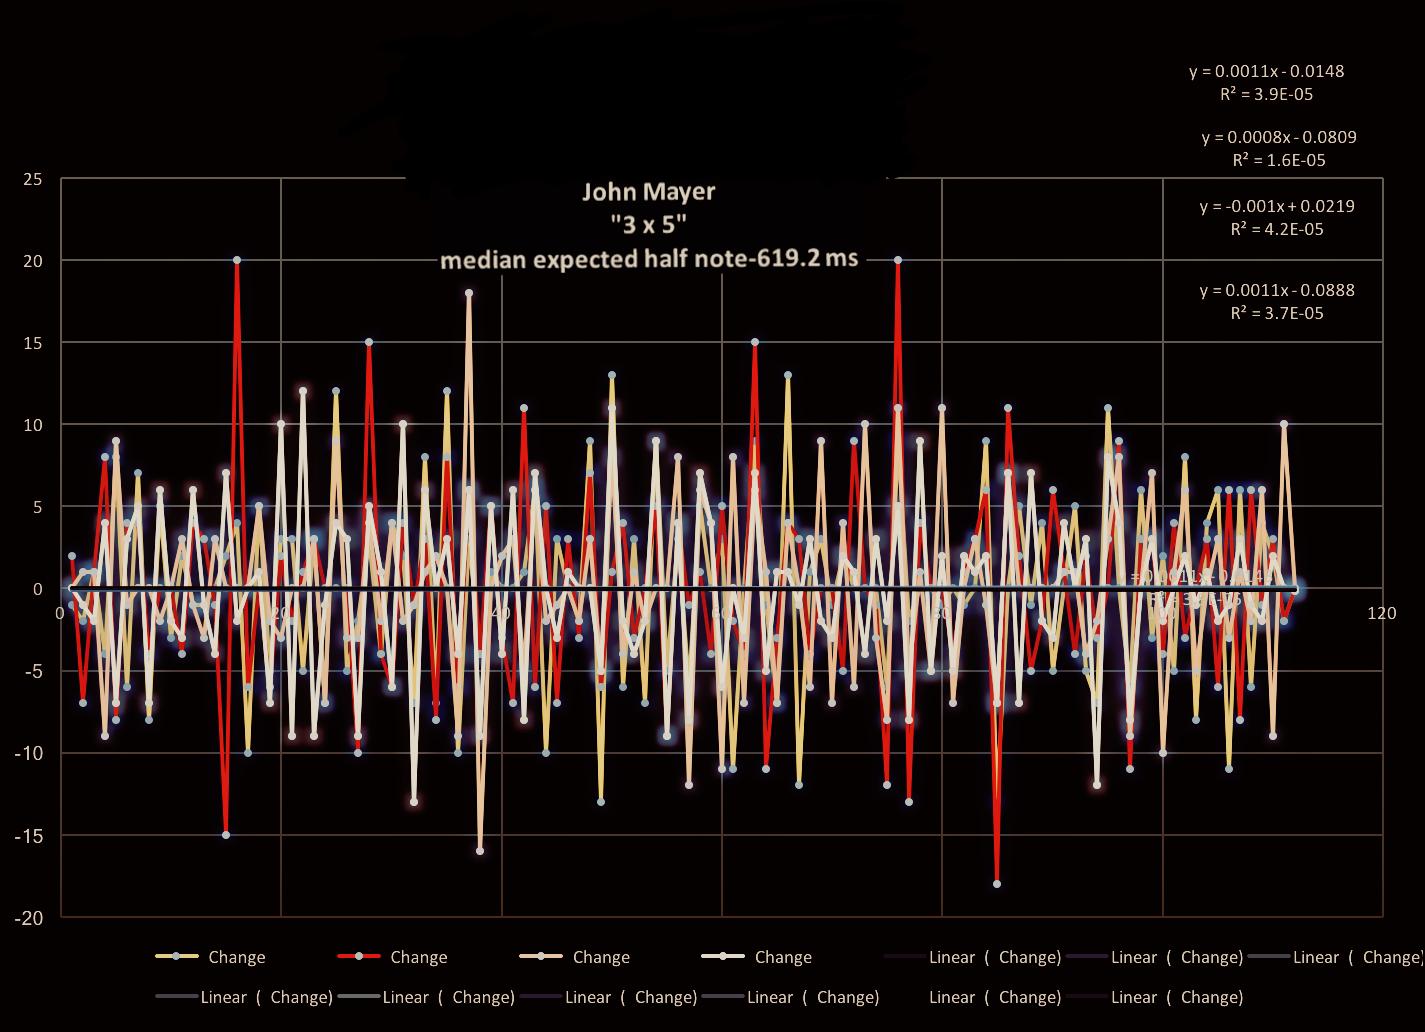 John-Mayer-3-by-5-matherton-tempo-diagram - 1